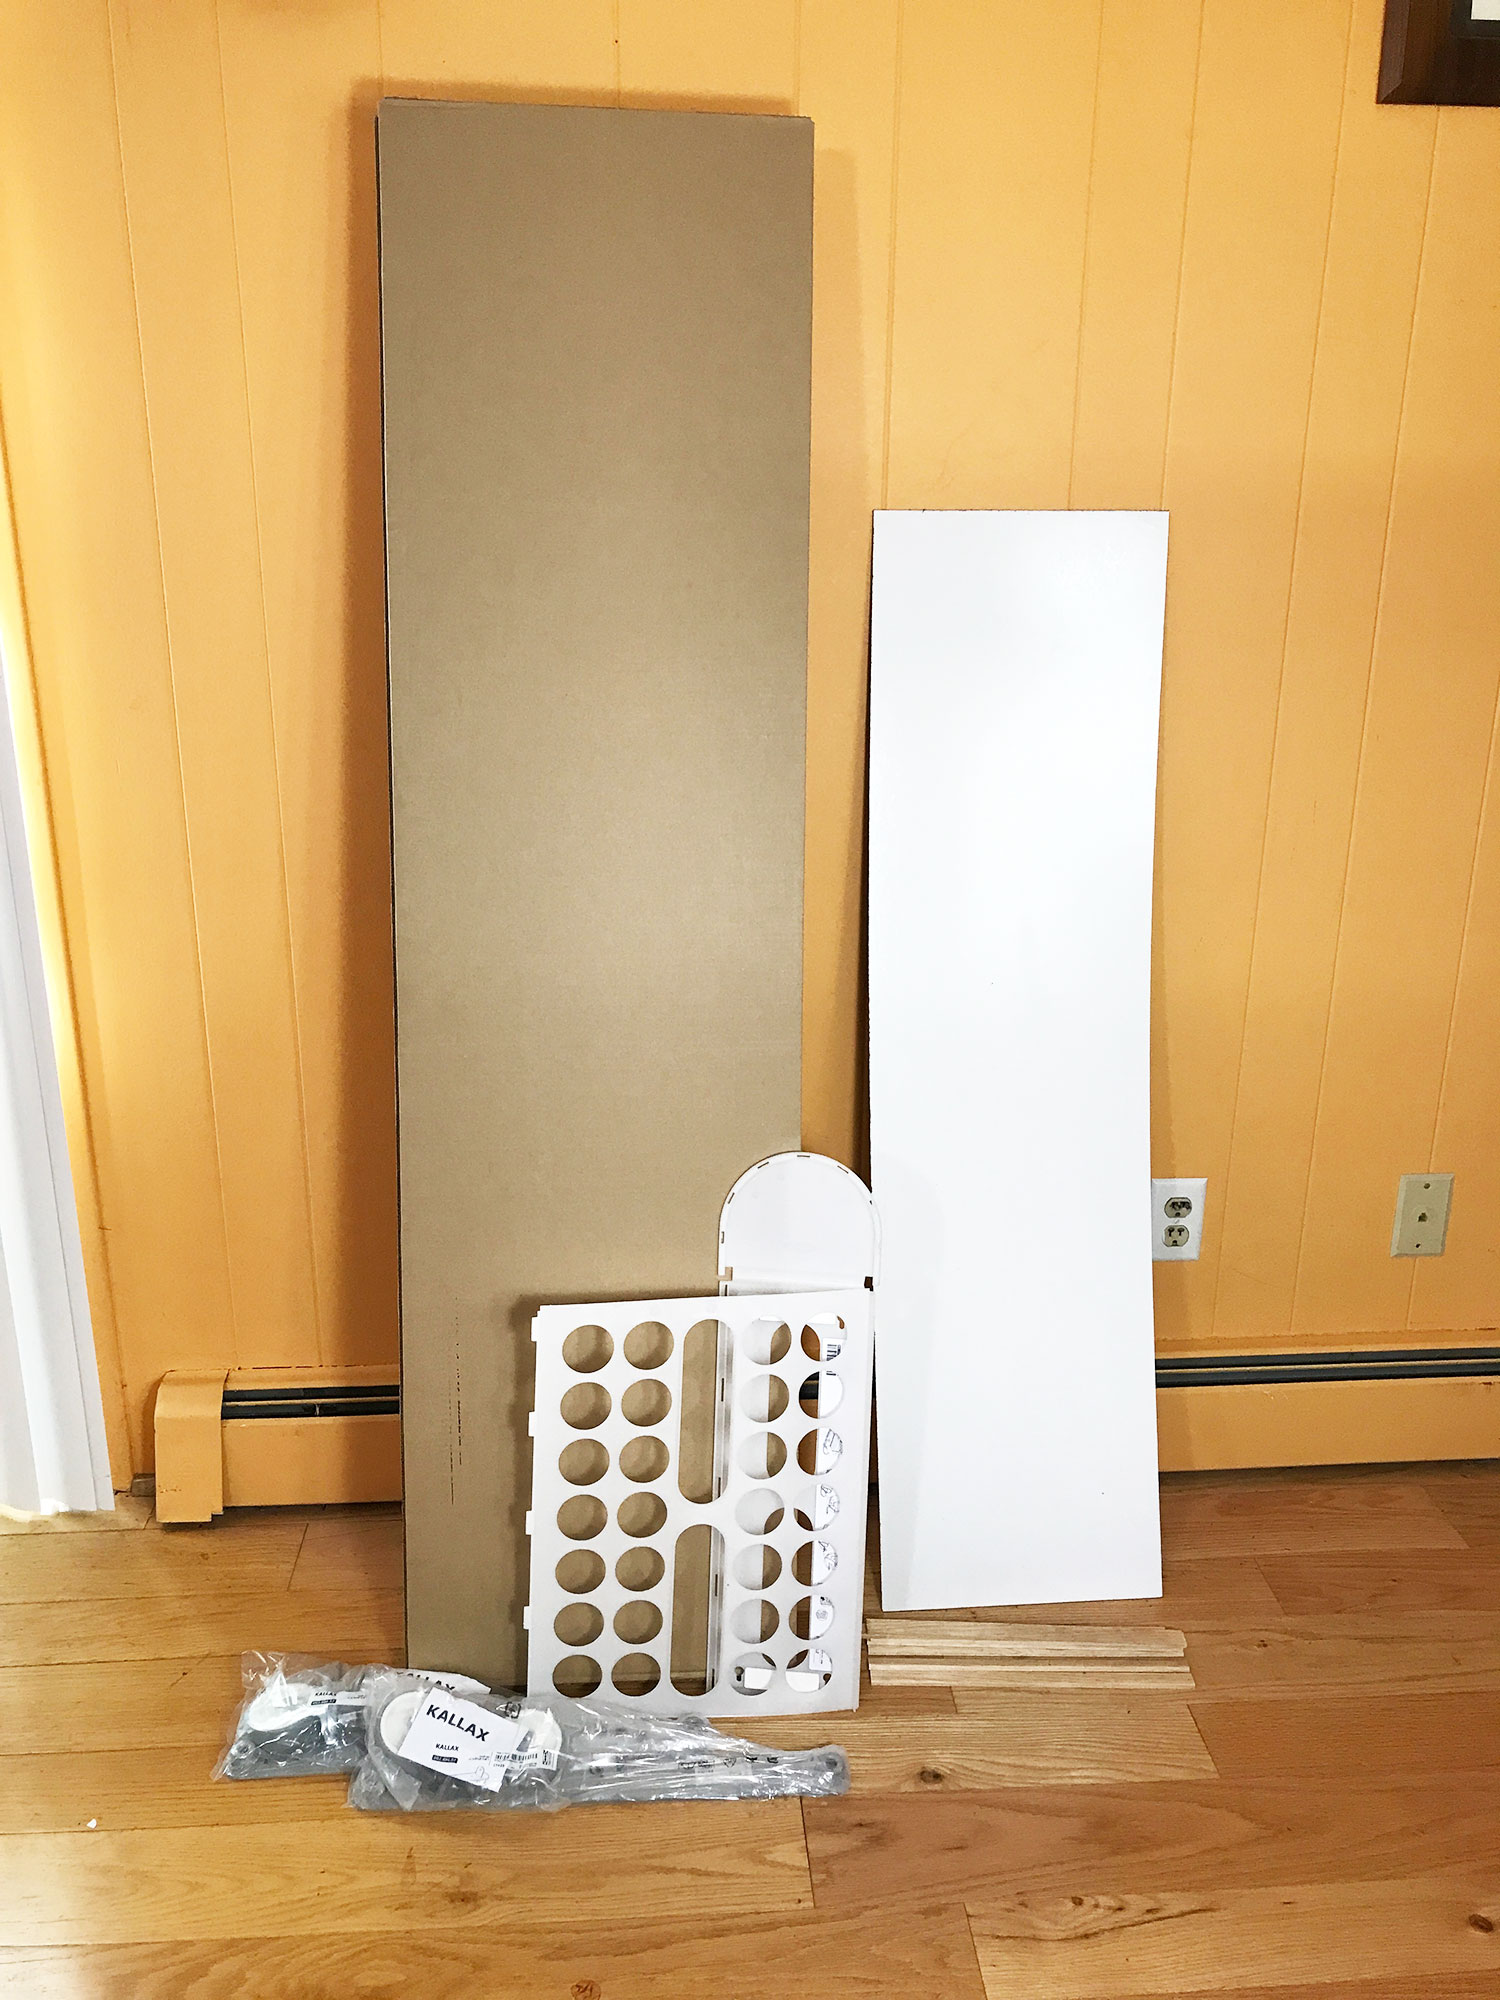 IKEA Kallax Ready To Be Assembled